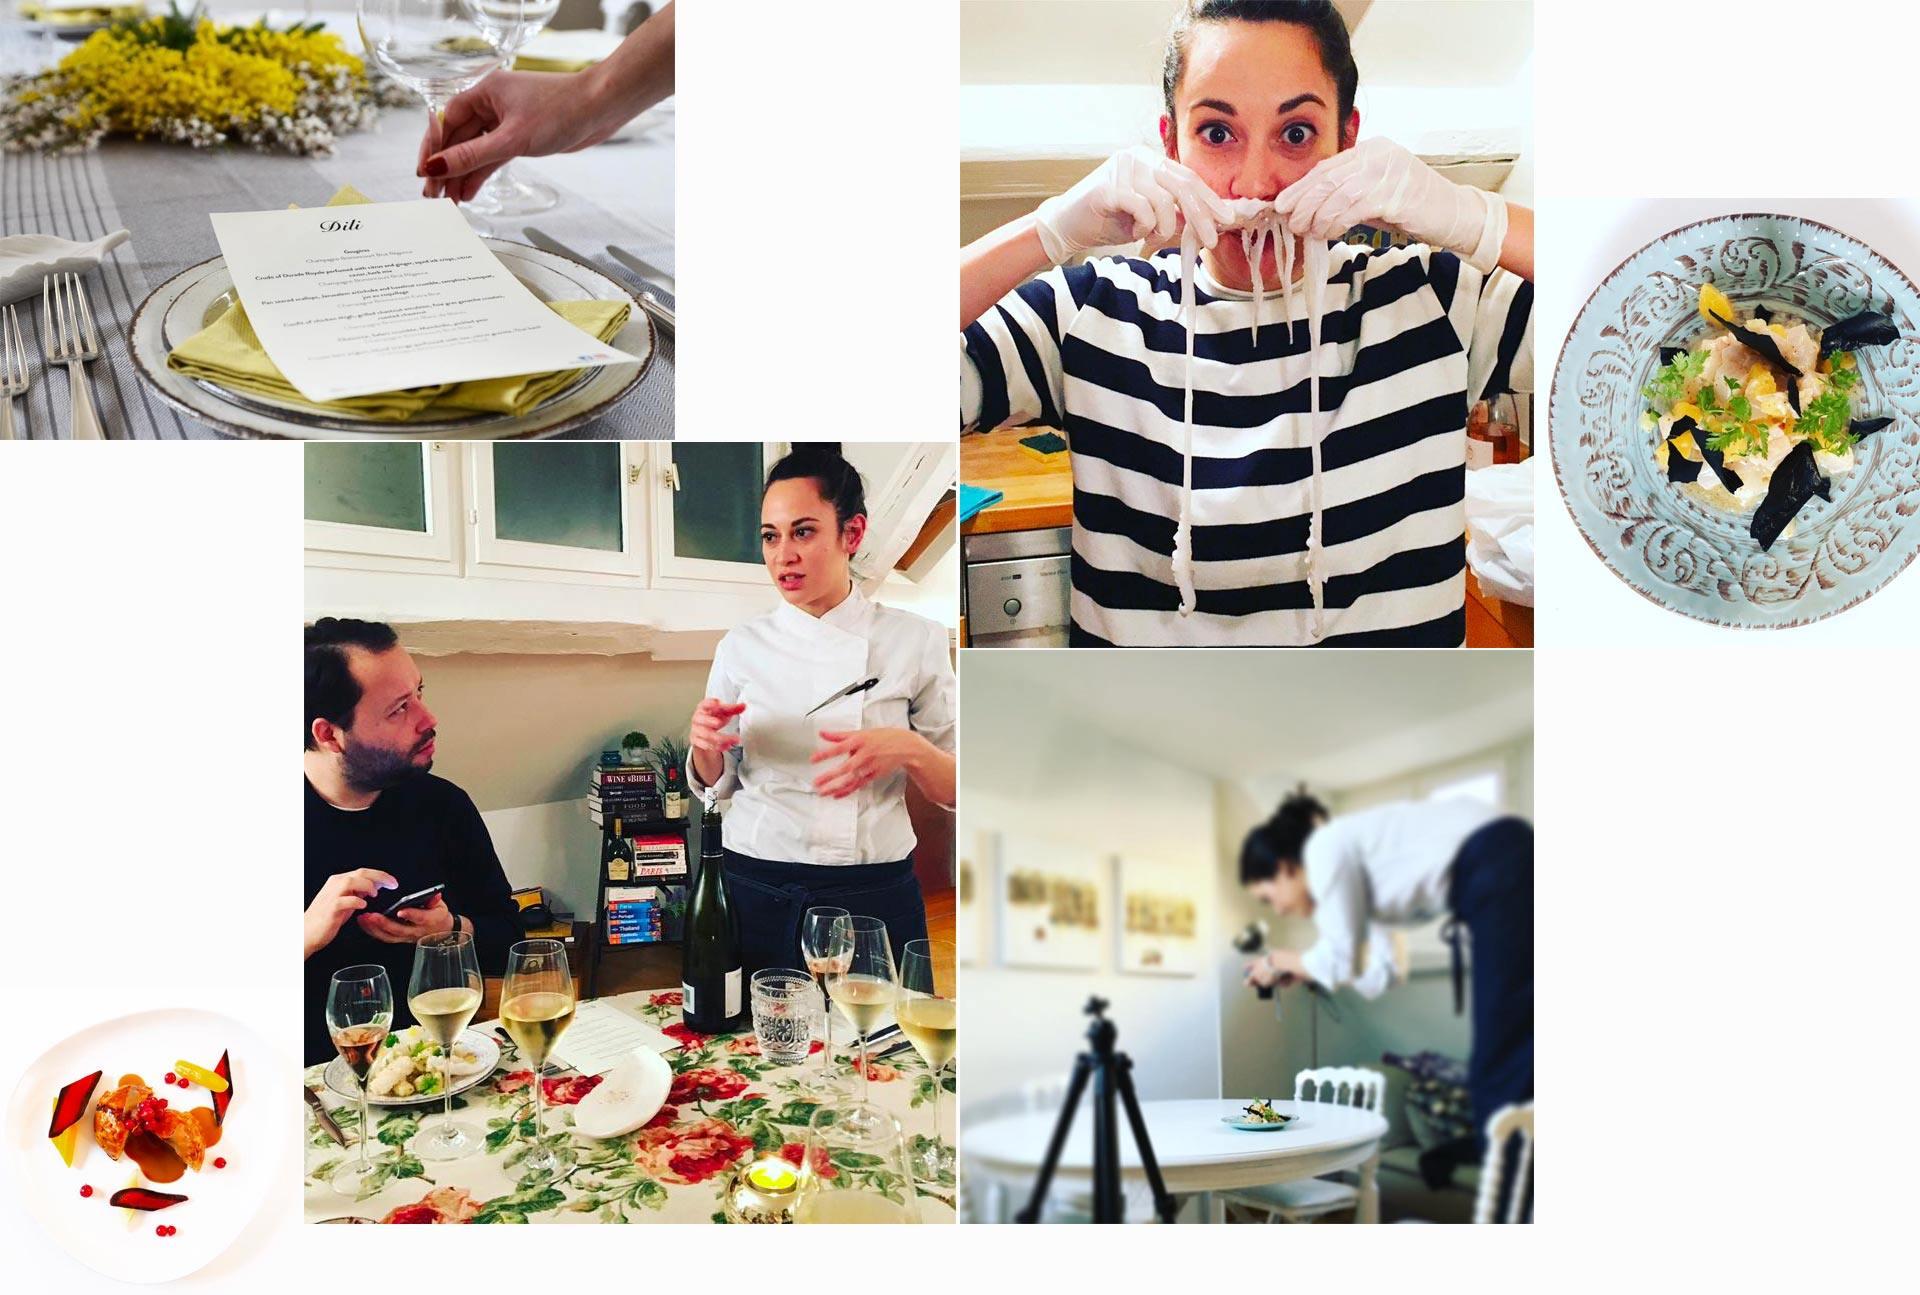 Lizzie Kwee Cuisine Diploma alumna